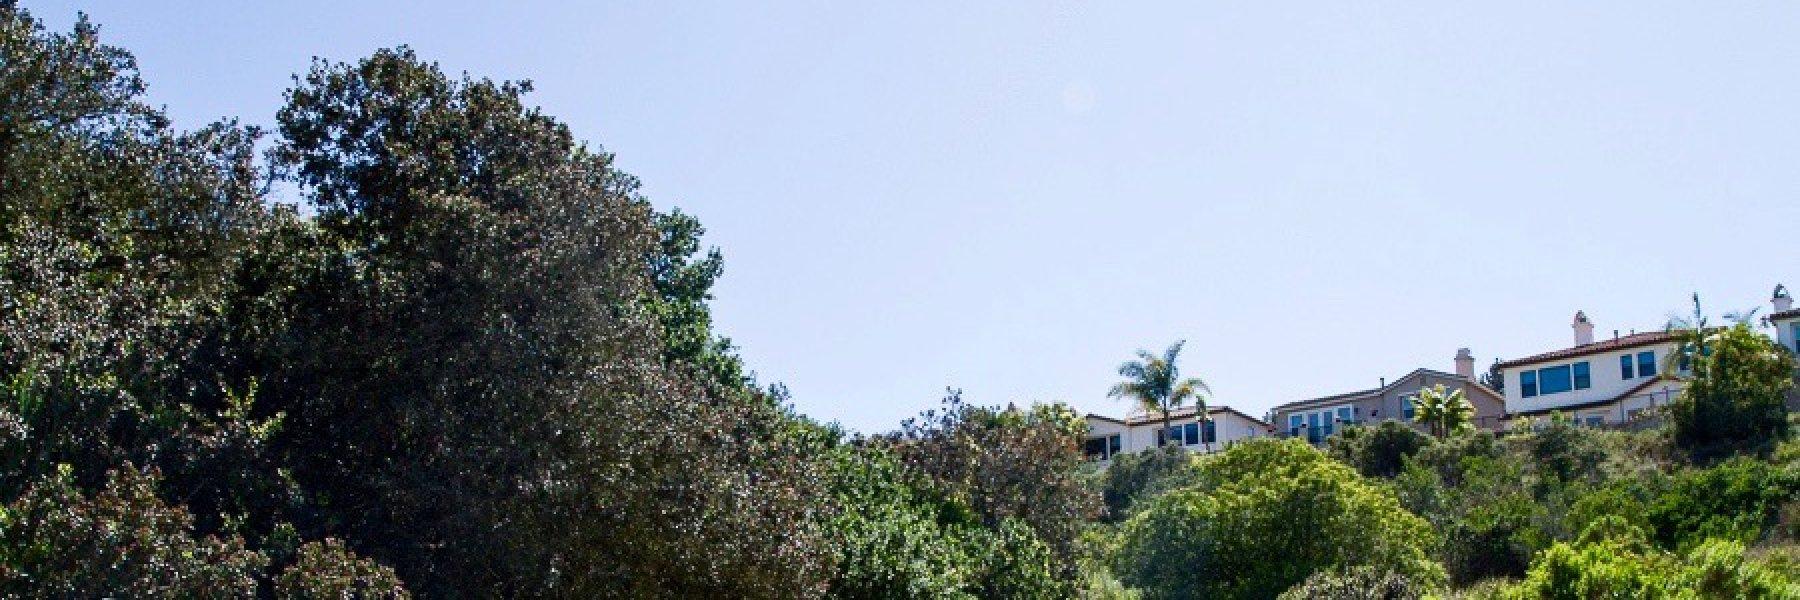 Vista Santa Barbara is a community of homes in San Diego California